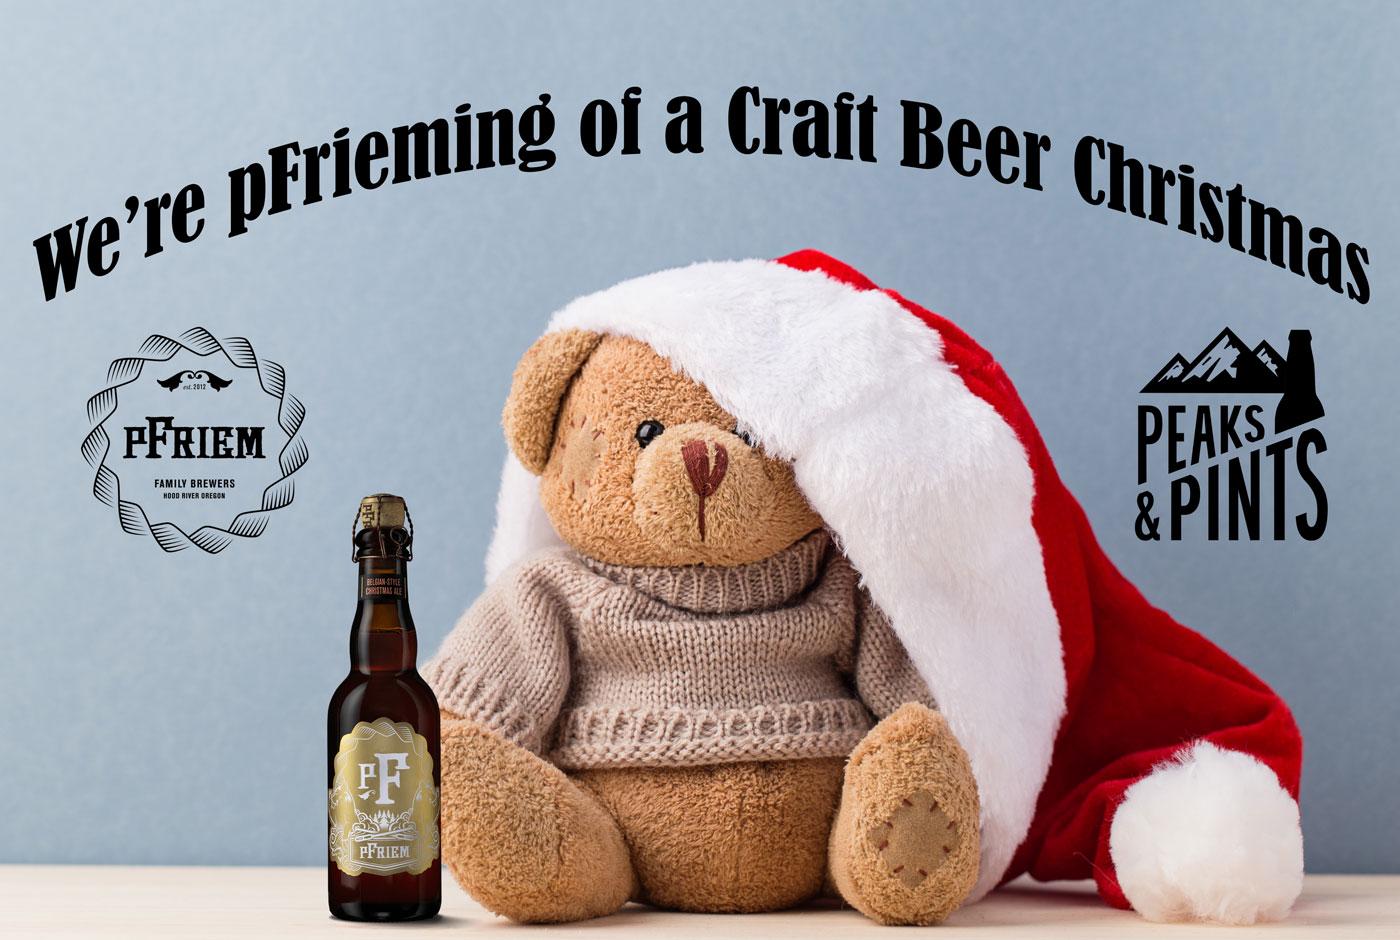 Were-pFrieming-of-a-Craft-Beer-Christmas-calendar-2019